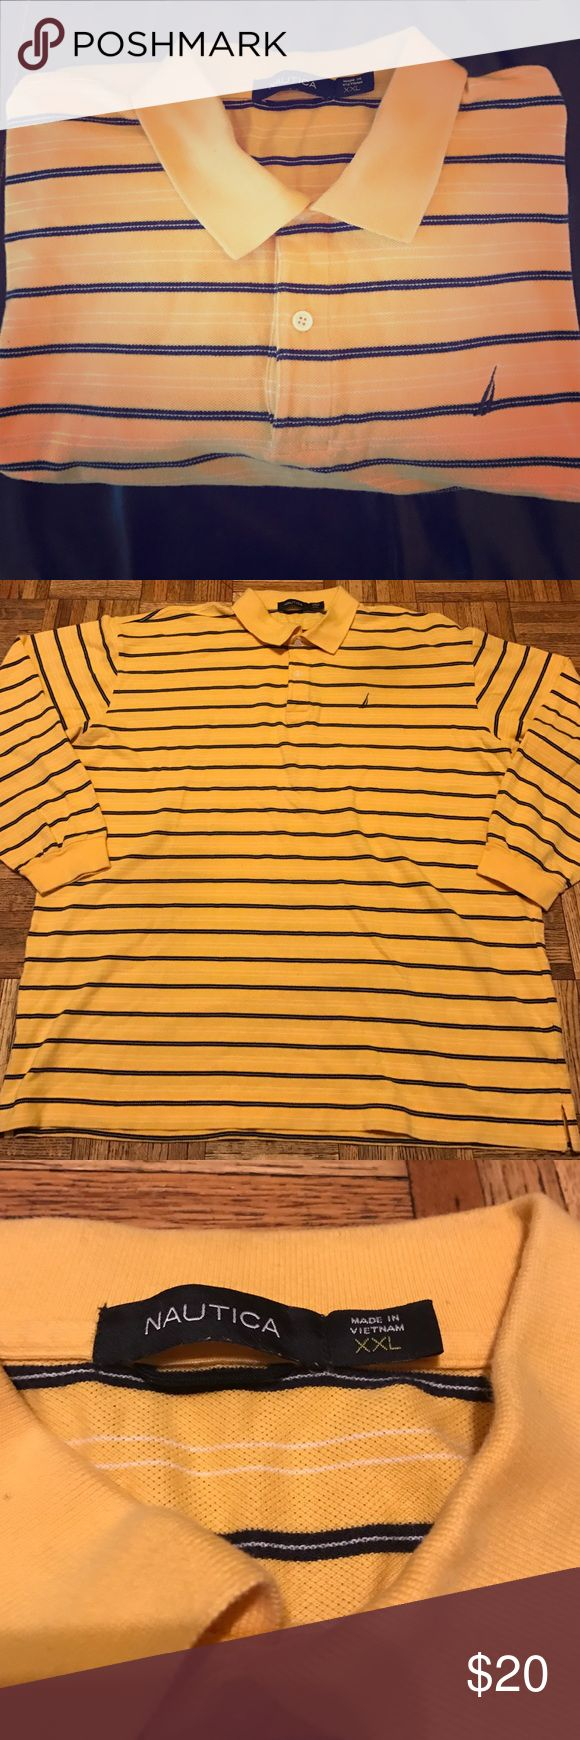 Nautica Men's Stripe Long  Sleeve Polo Shirt XXL Nautica men's long sleeve polo shirt. This is a Striped yellow, blue and white shirt. Size XXL Nautica Shirts Polos